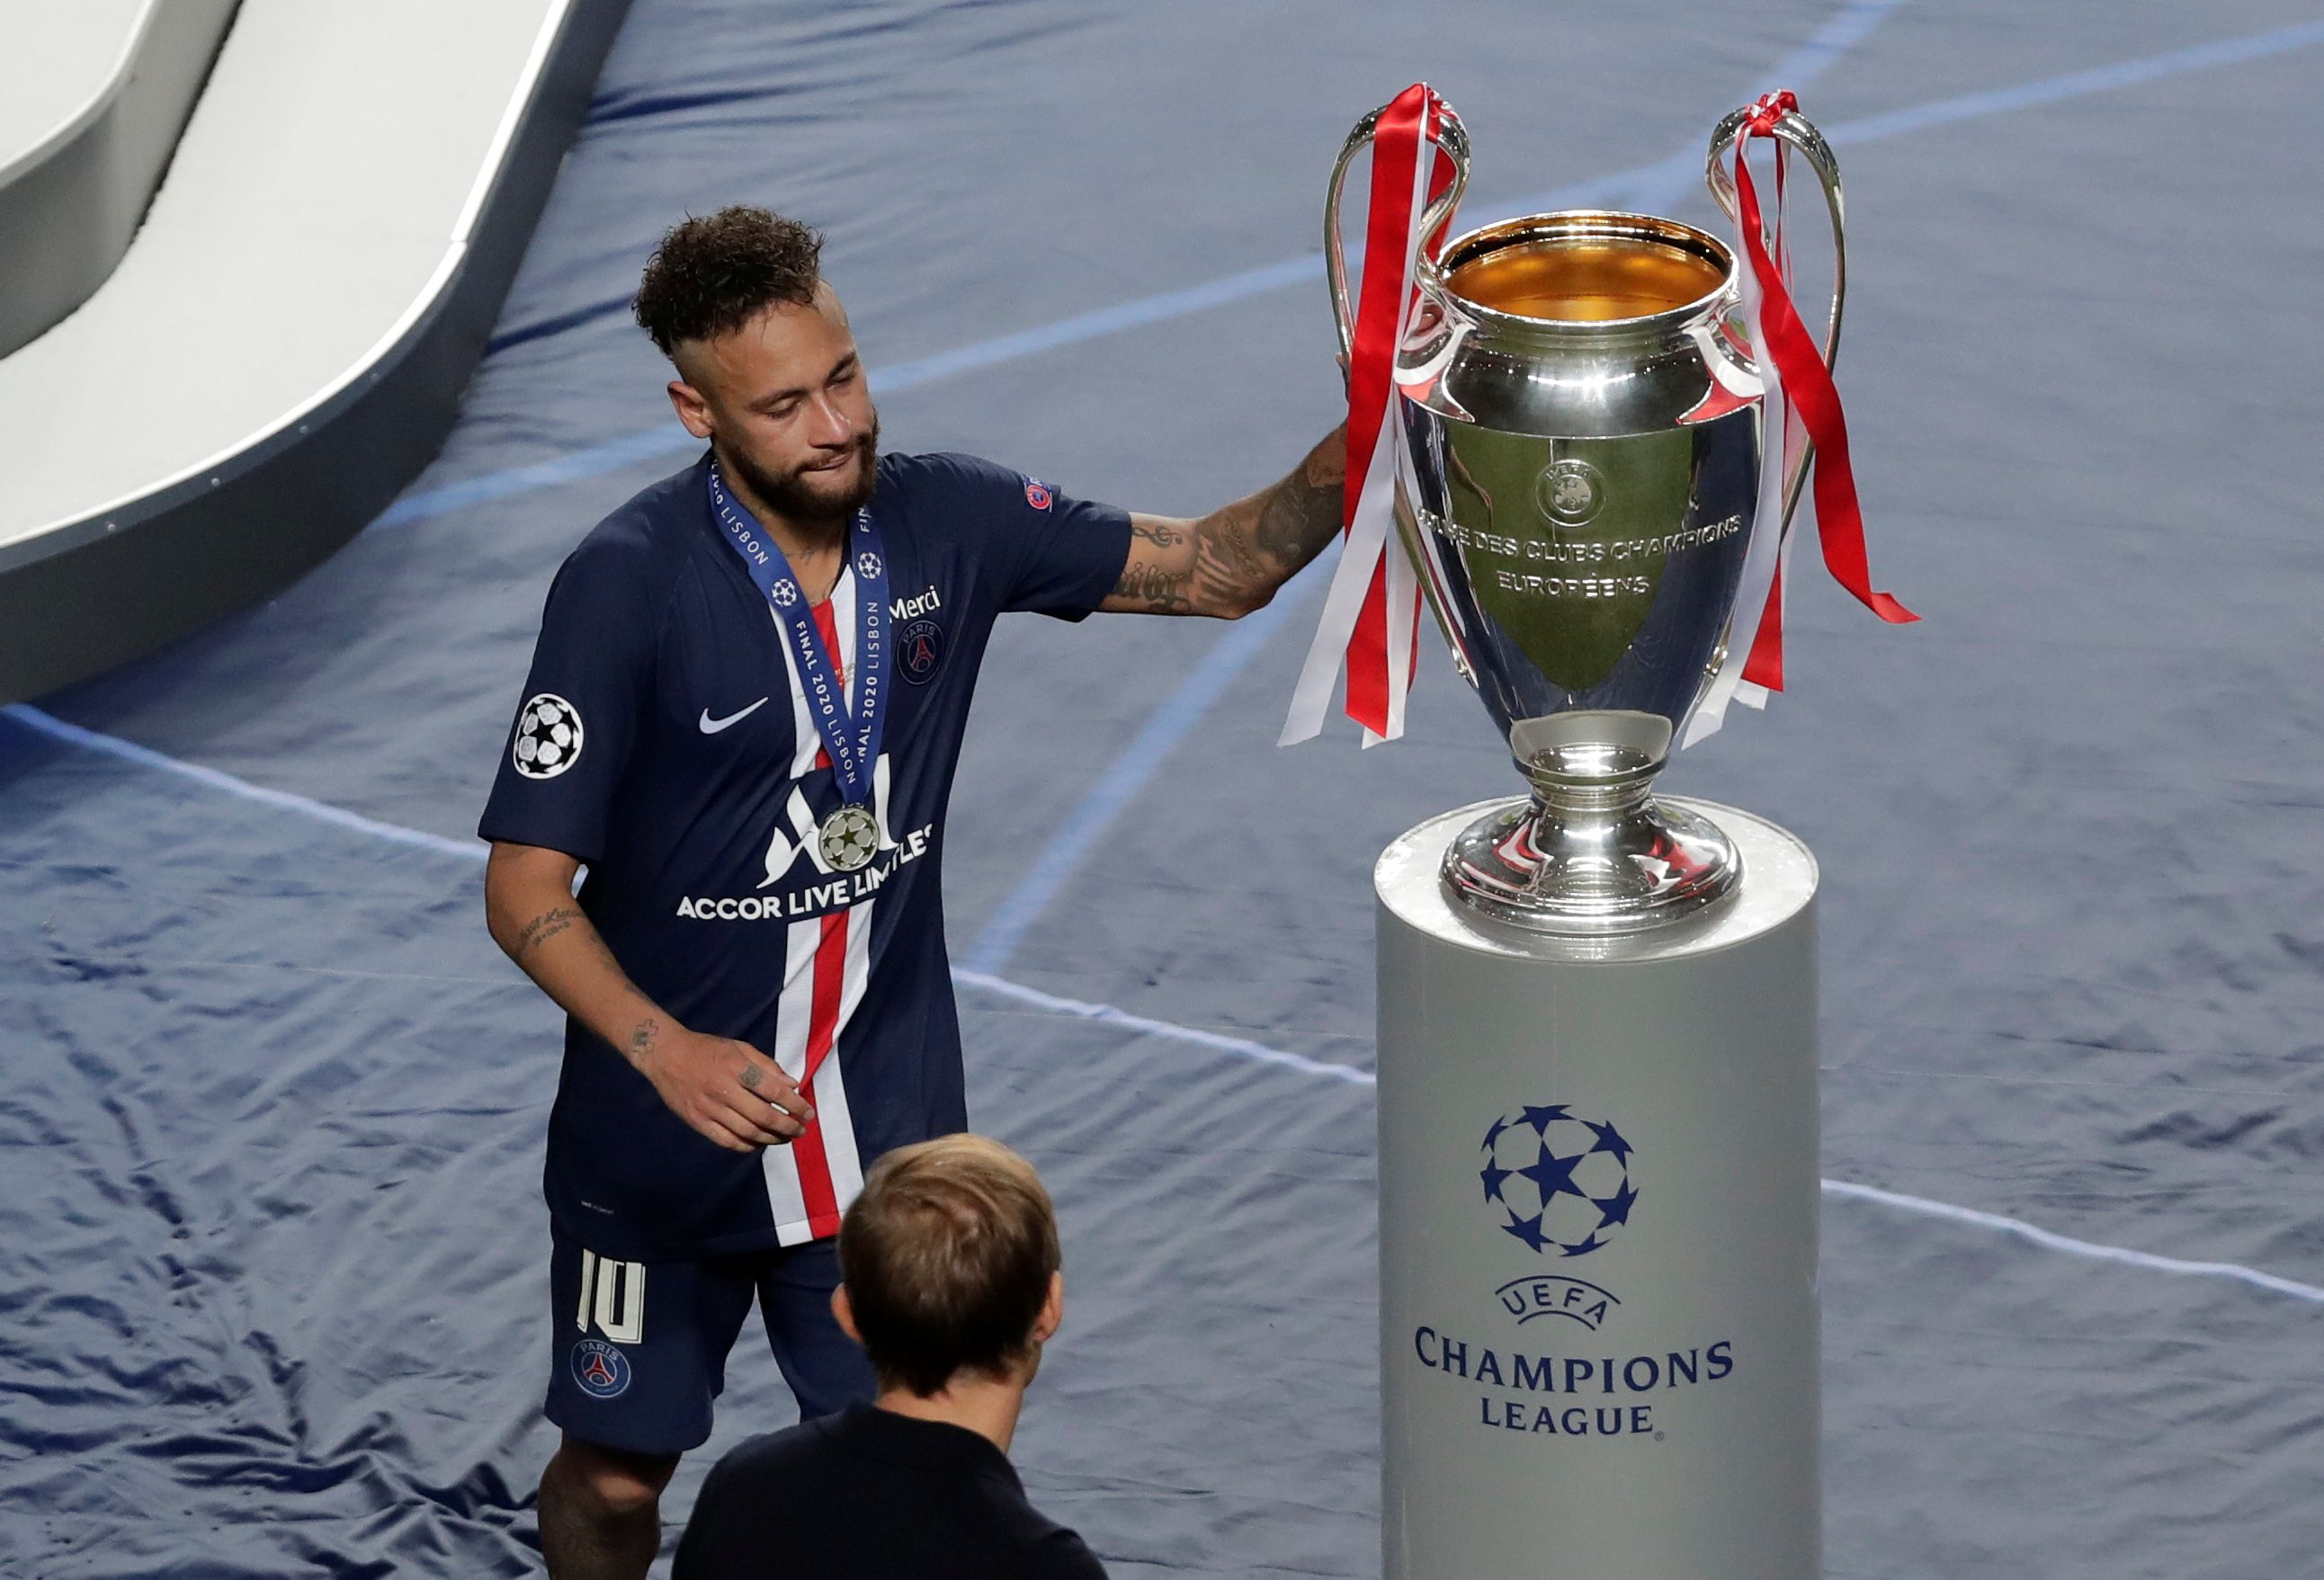 Neymar toca la copa tras la decepción (Manu Fernandez/Pool via REUTERS)